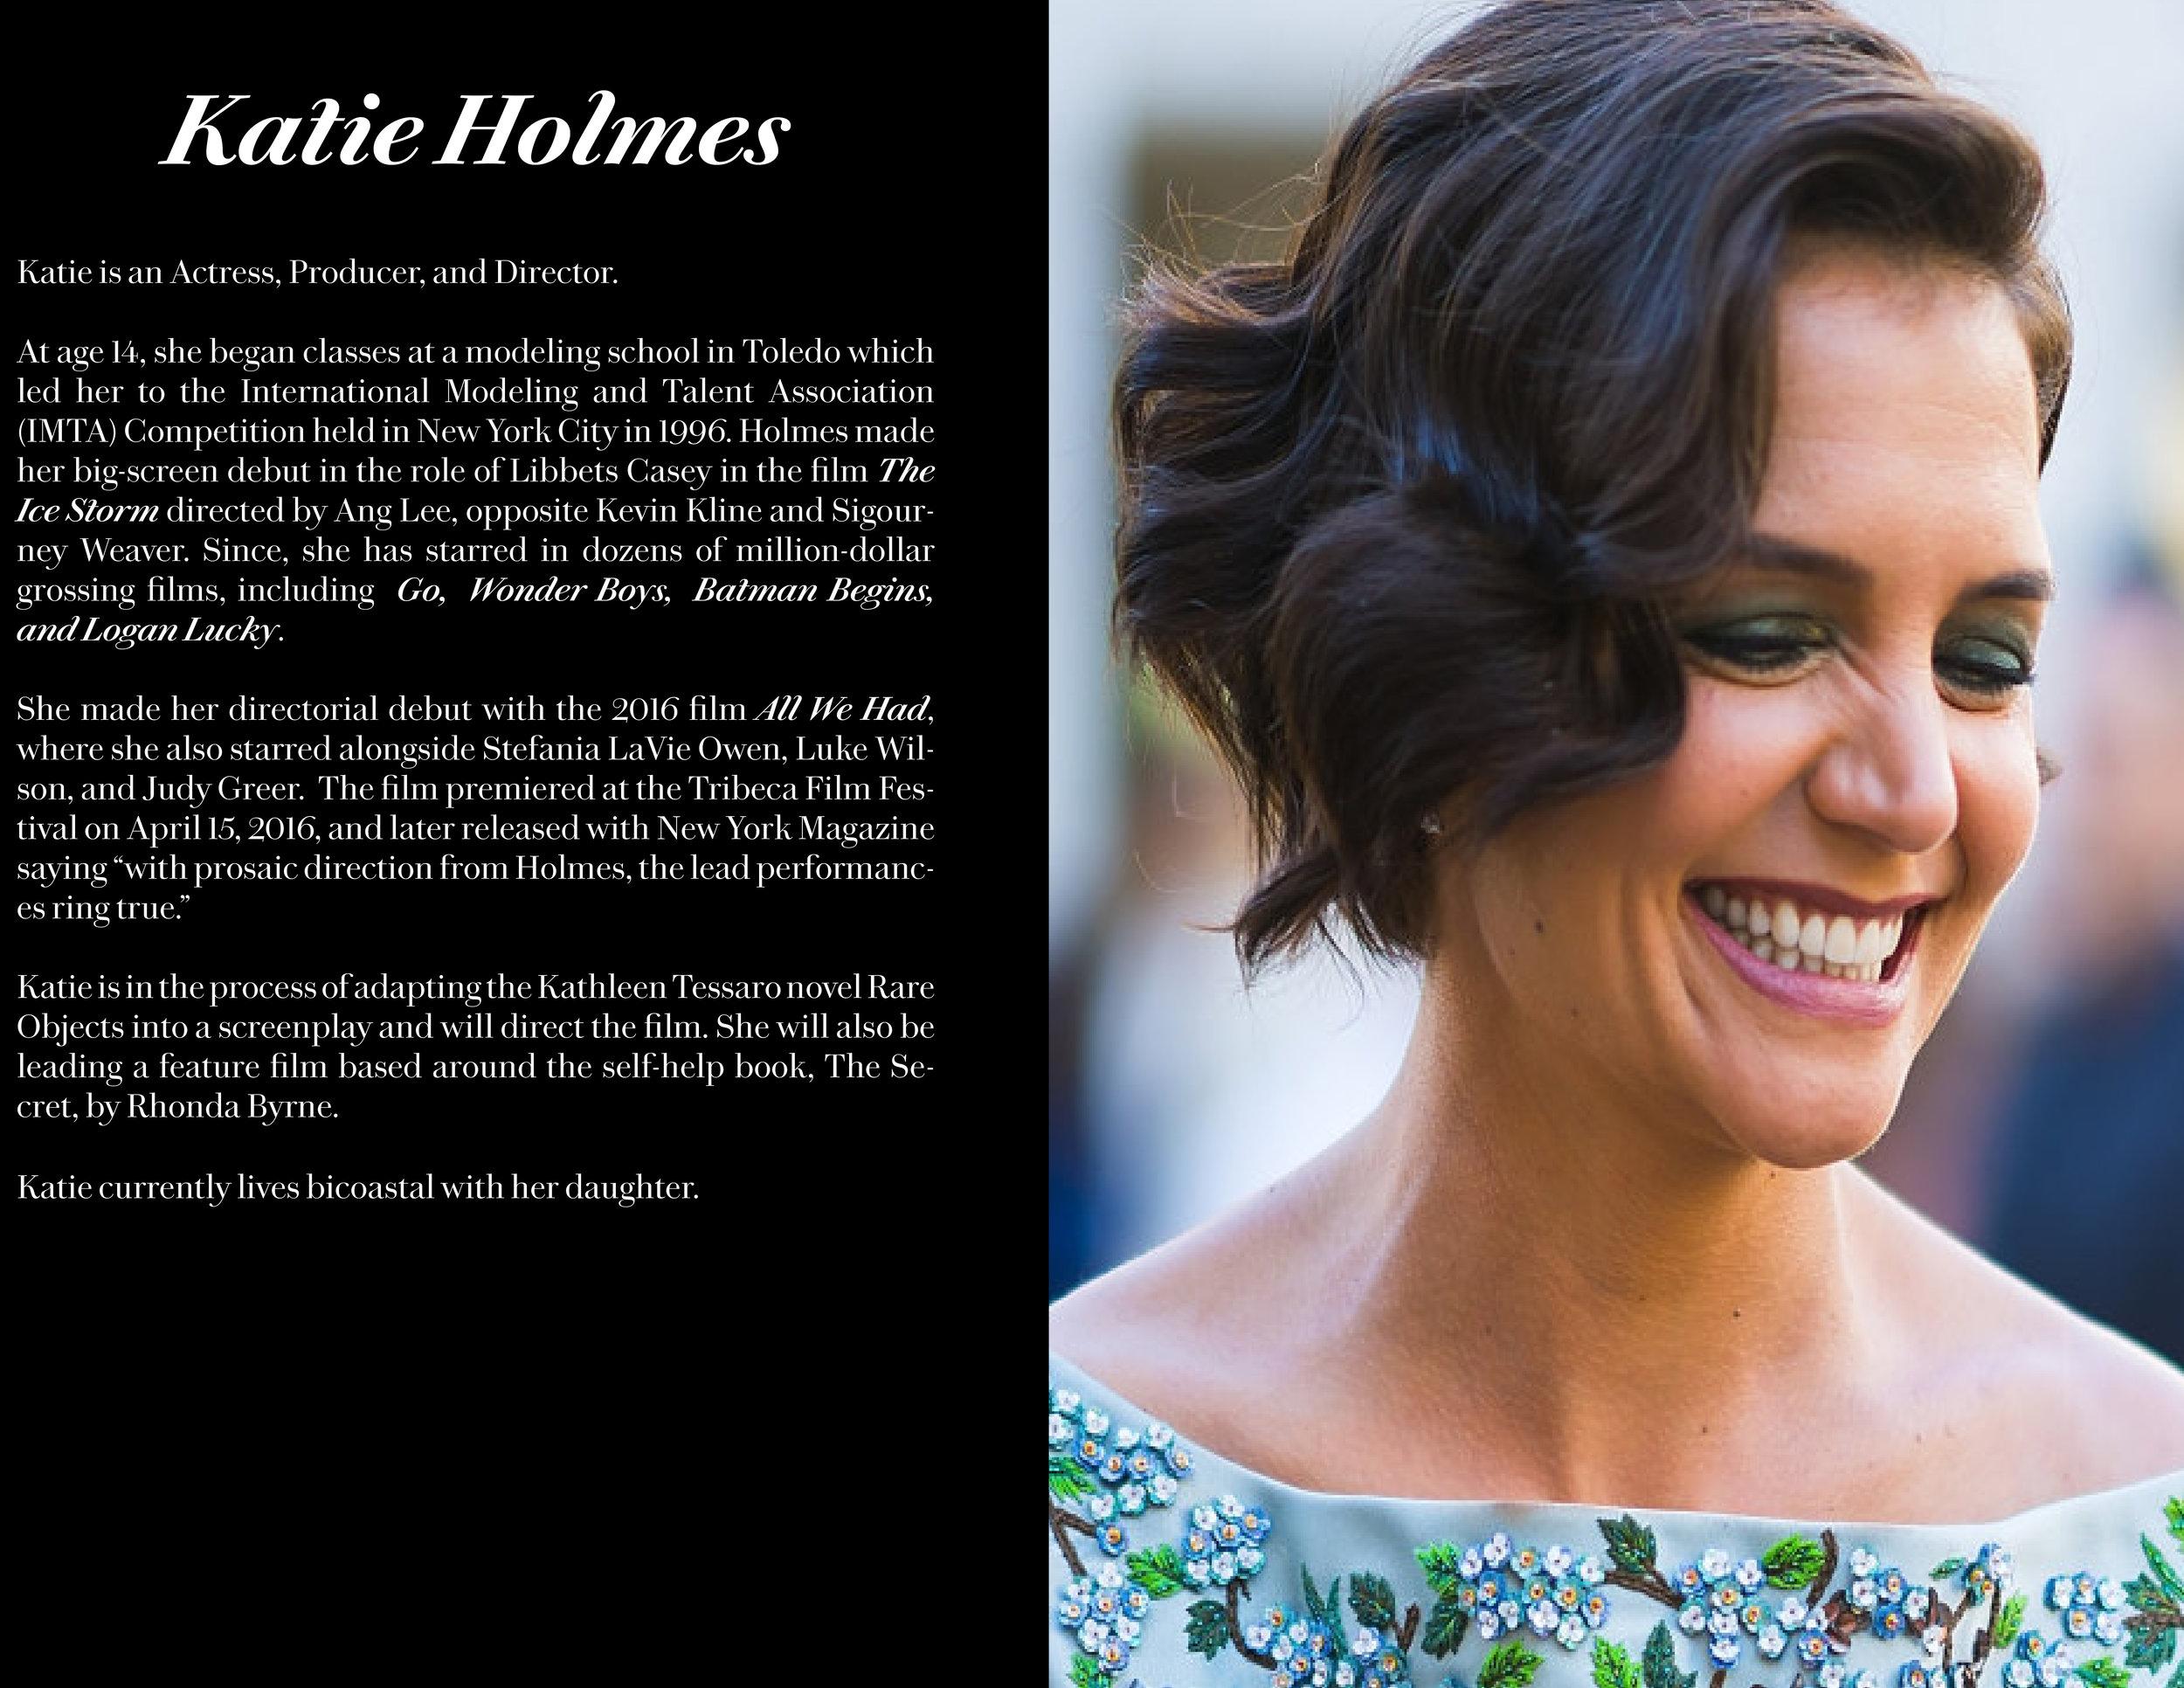 Kate Holmes Bio 03.27.19.jpg